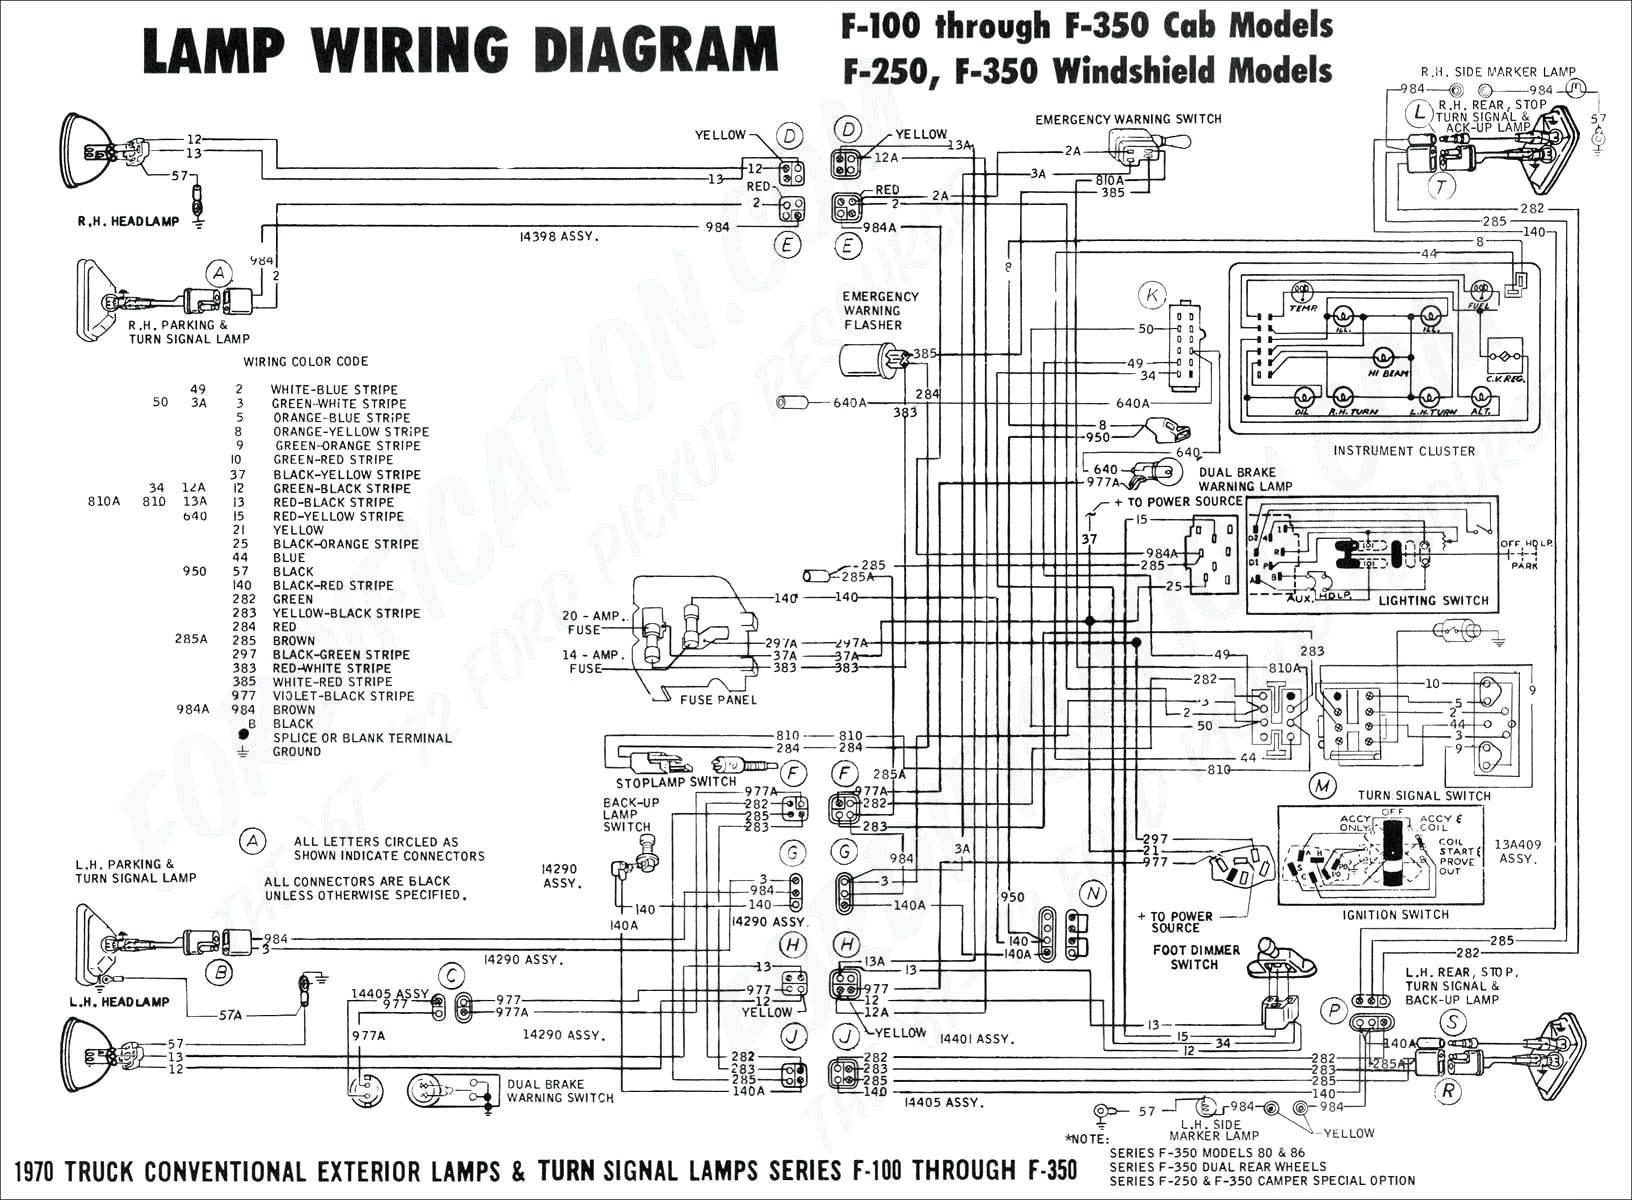 05 Trailblazer Radio Wire Diagrams Ethernet End Wiring Diagram Of 05 Trailblazer Radio Wire Diagrams